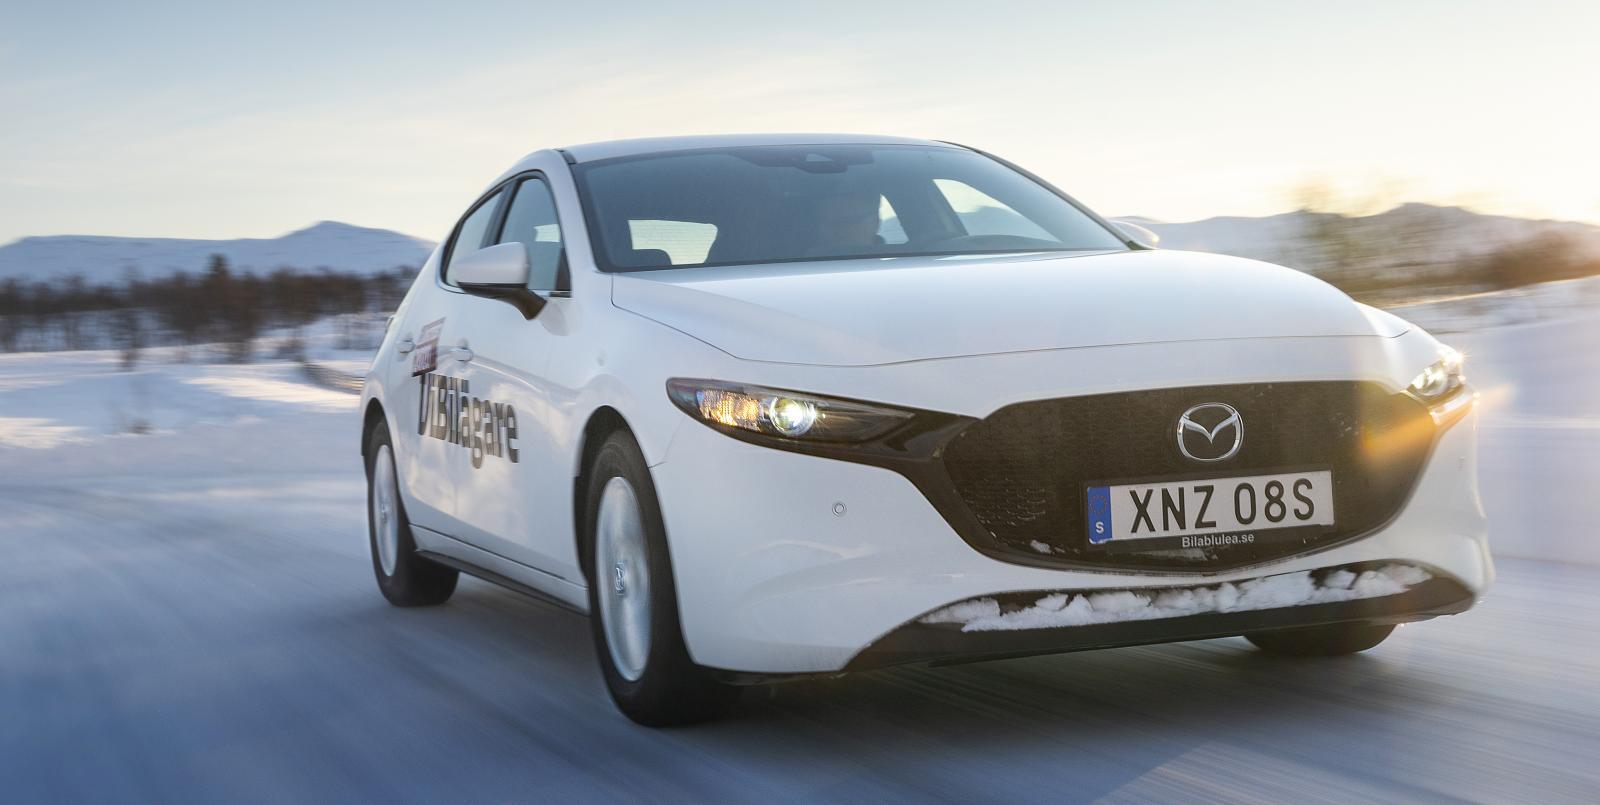 Vintertest: BMW 3-serie, Mazda 3, Renault Clio, Tesla Model 3 och Toyota Corolla (2020)